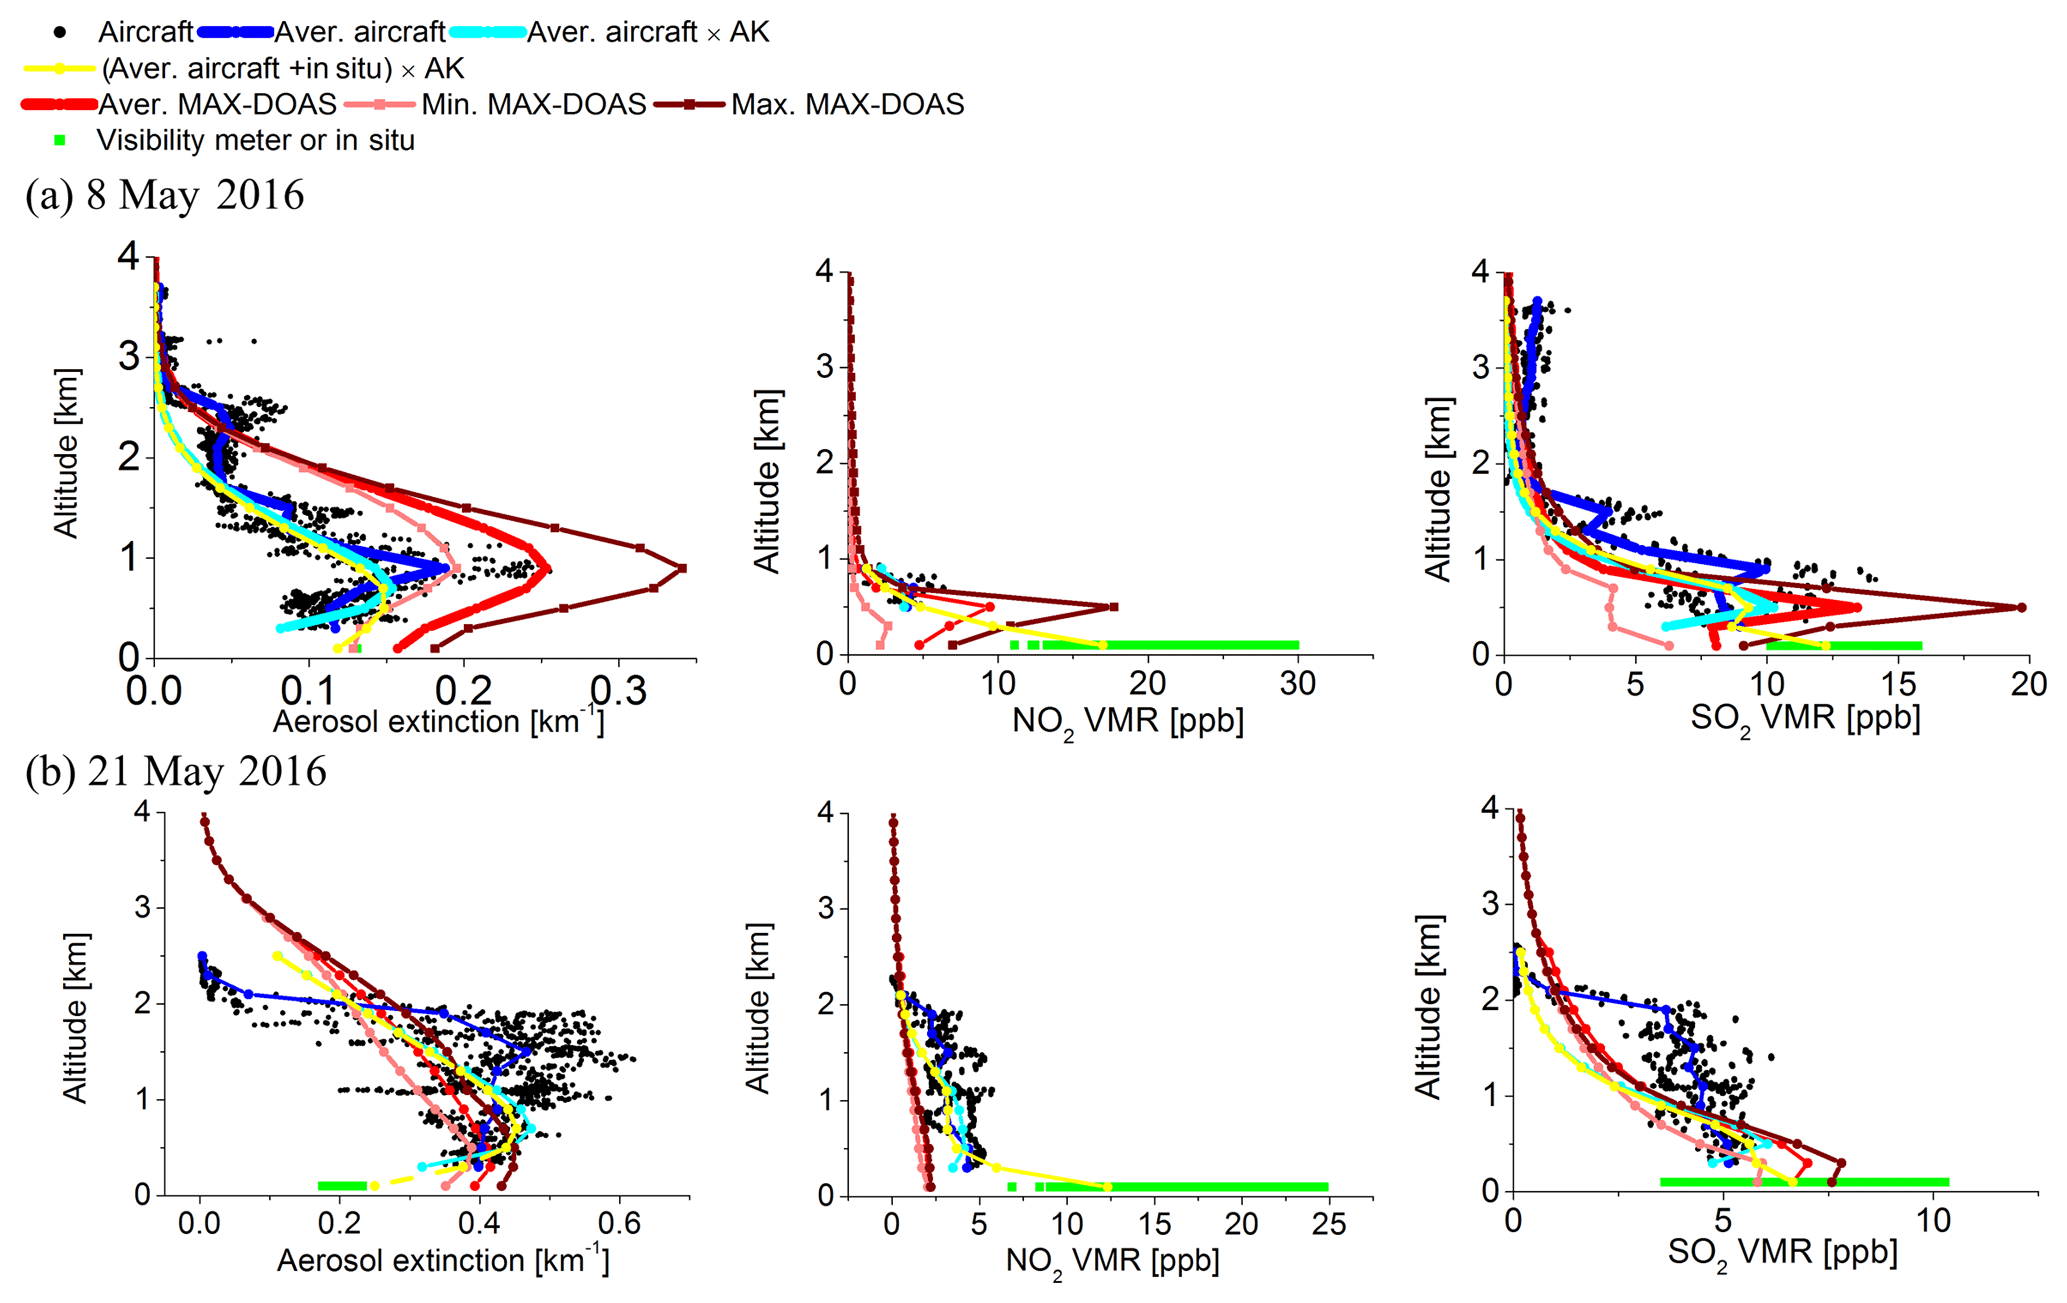 https://www.atmos-chem-phys.net/19/5417/2019/acp-19-5417-2019-f08